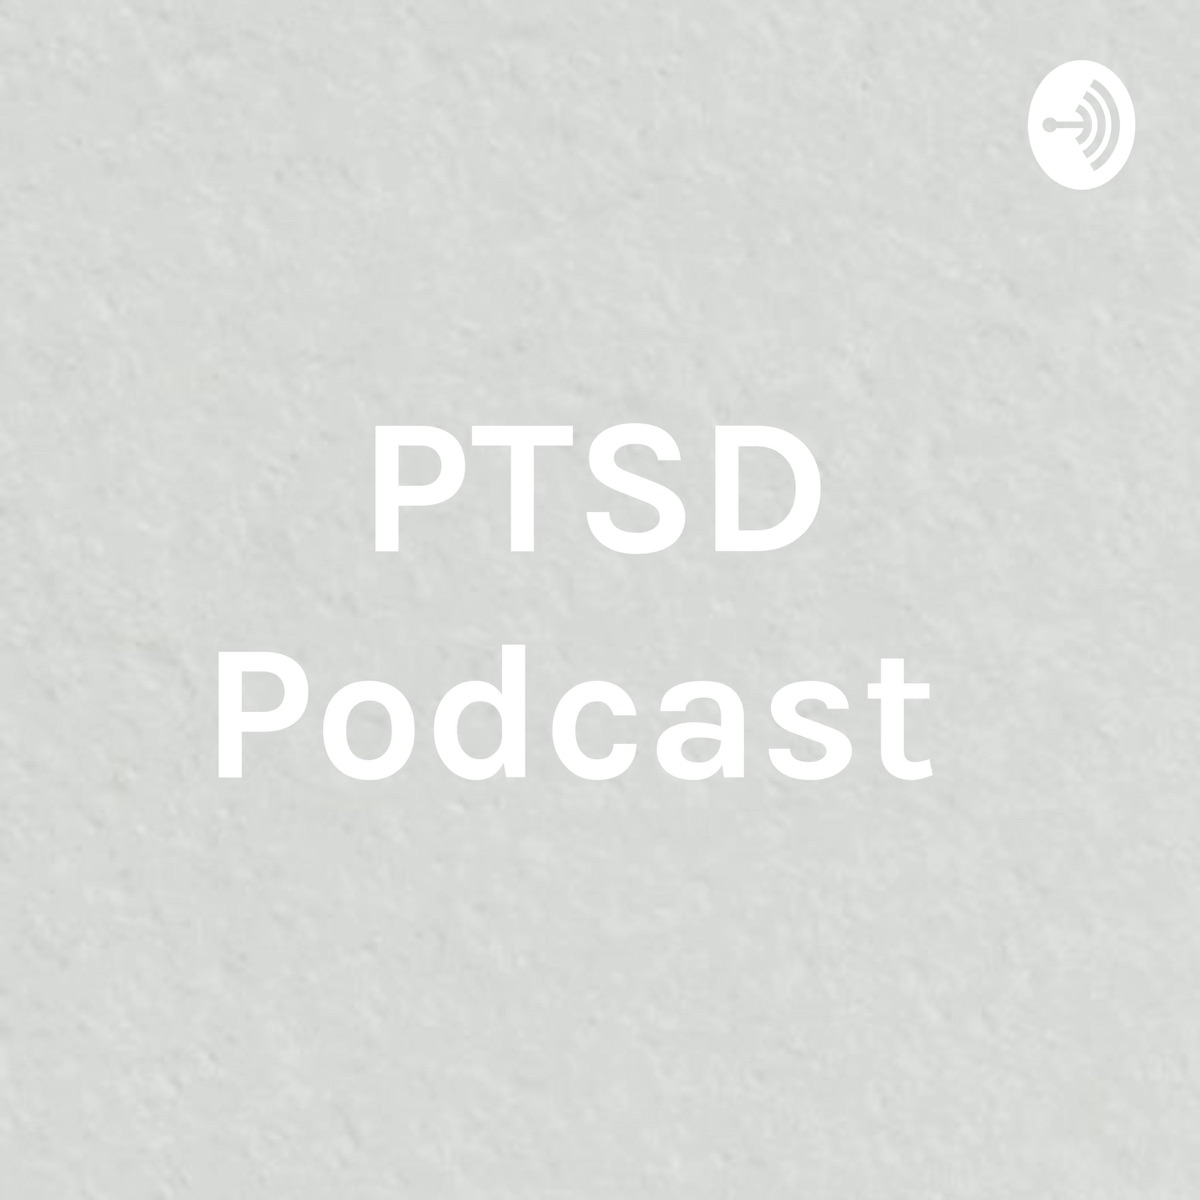 PTSD Podcast